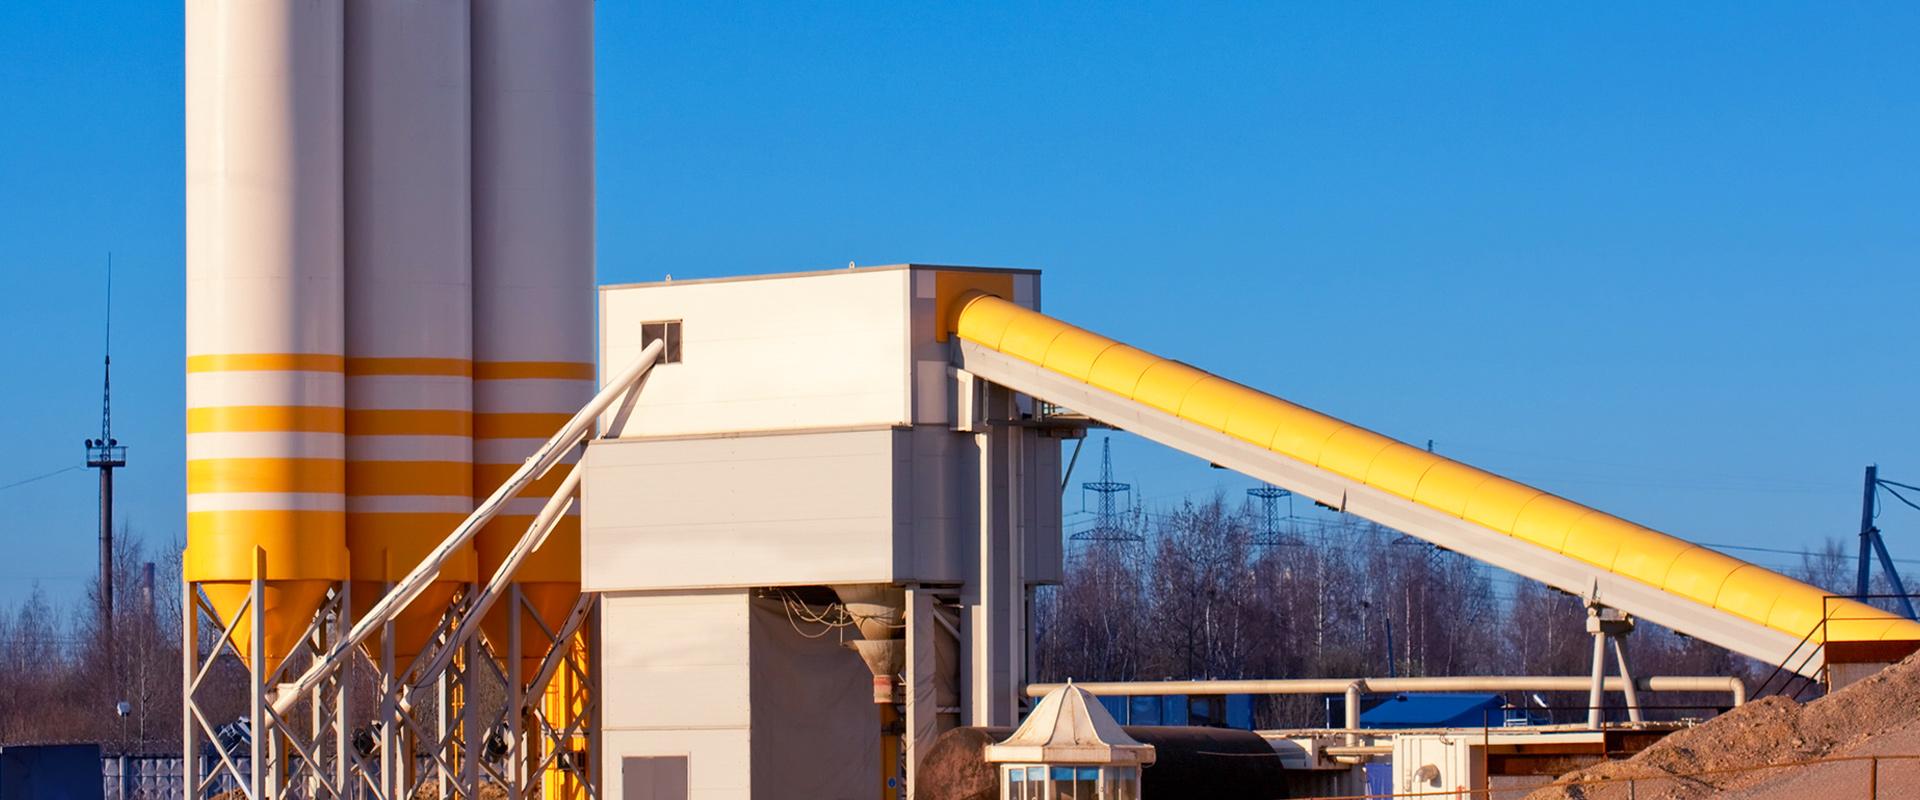 supCemtExpt水泥专家系统解决方案